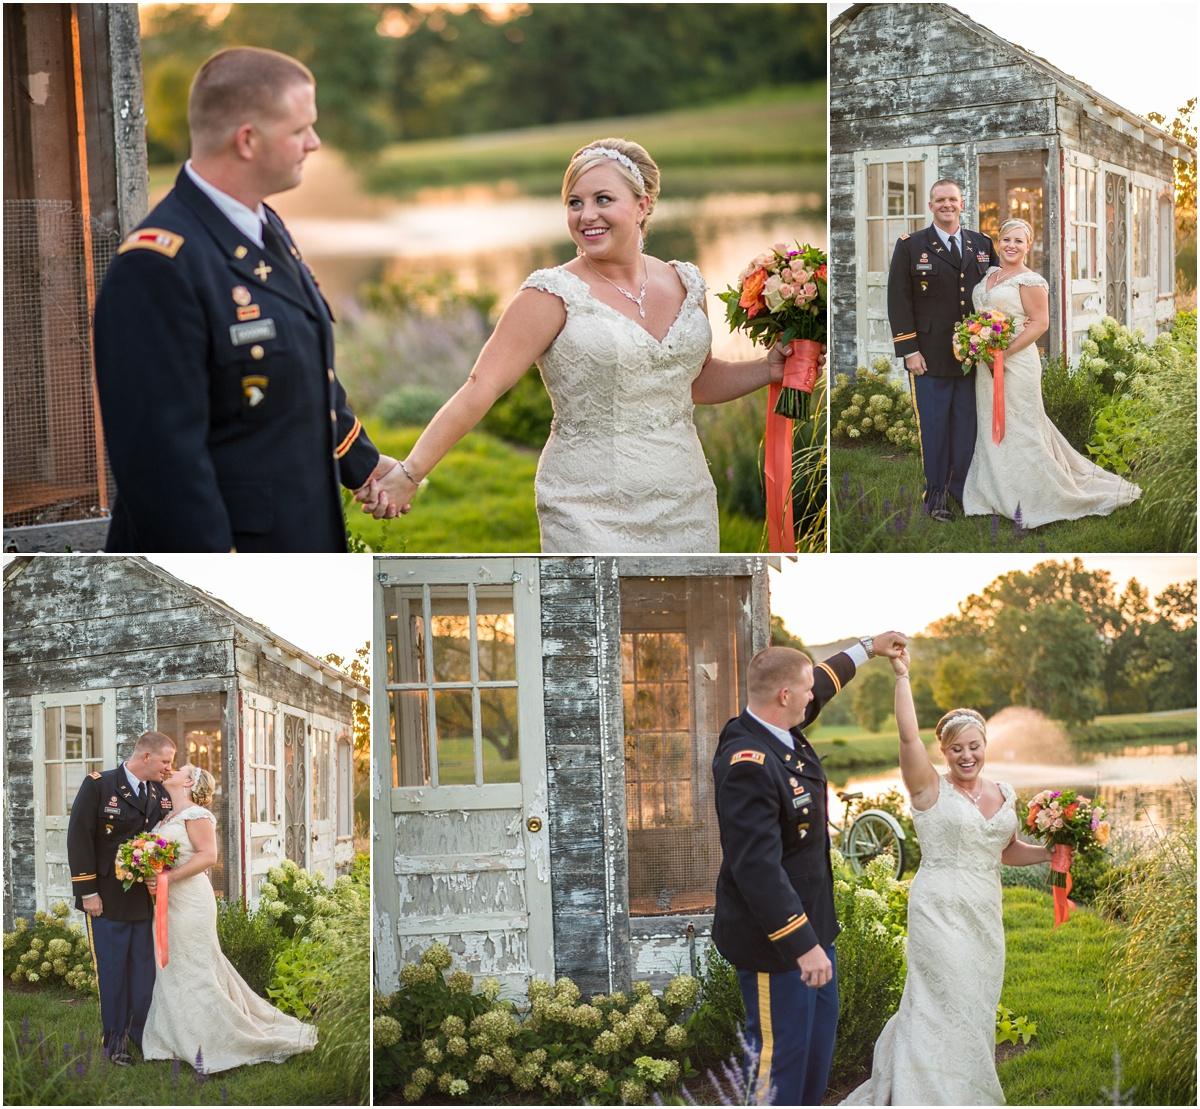 Greg Smit Photography Nashville wedding photographer Mint Springs Farm  23